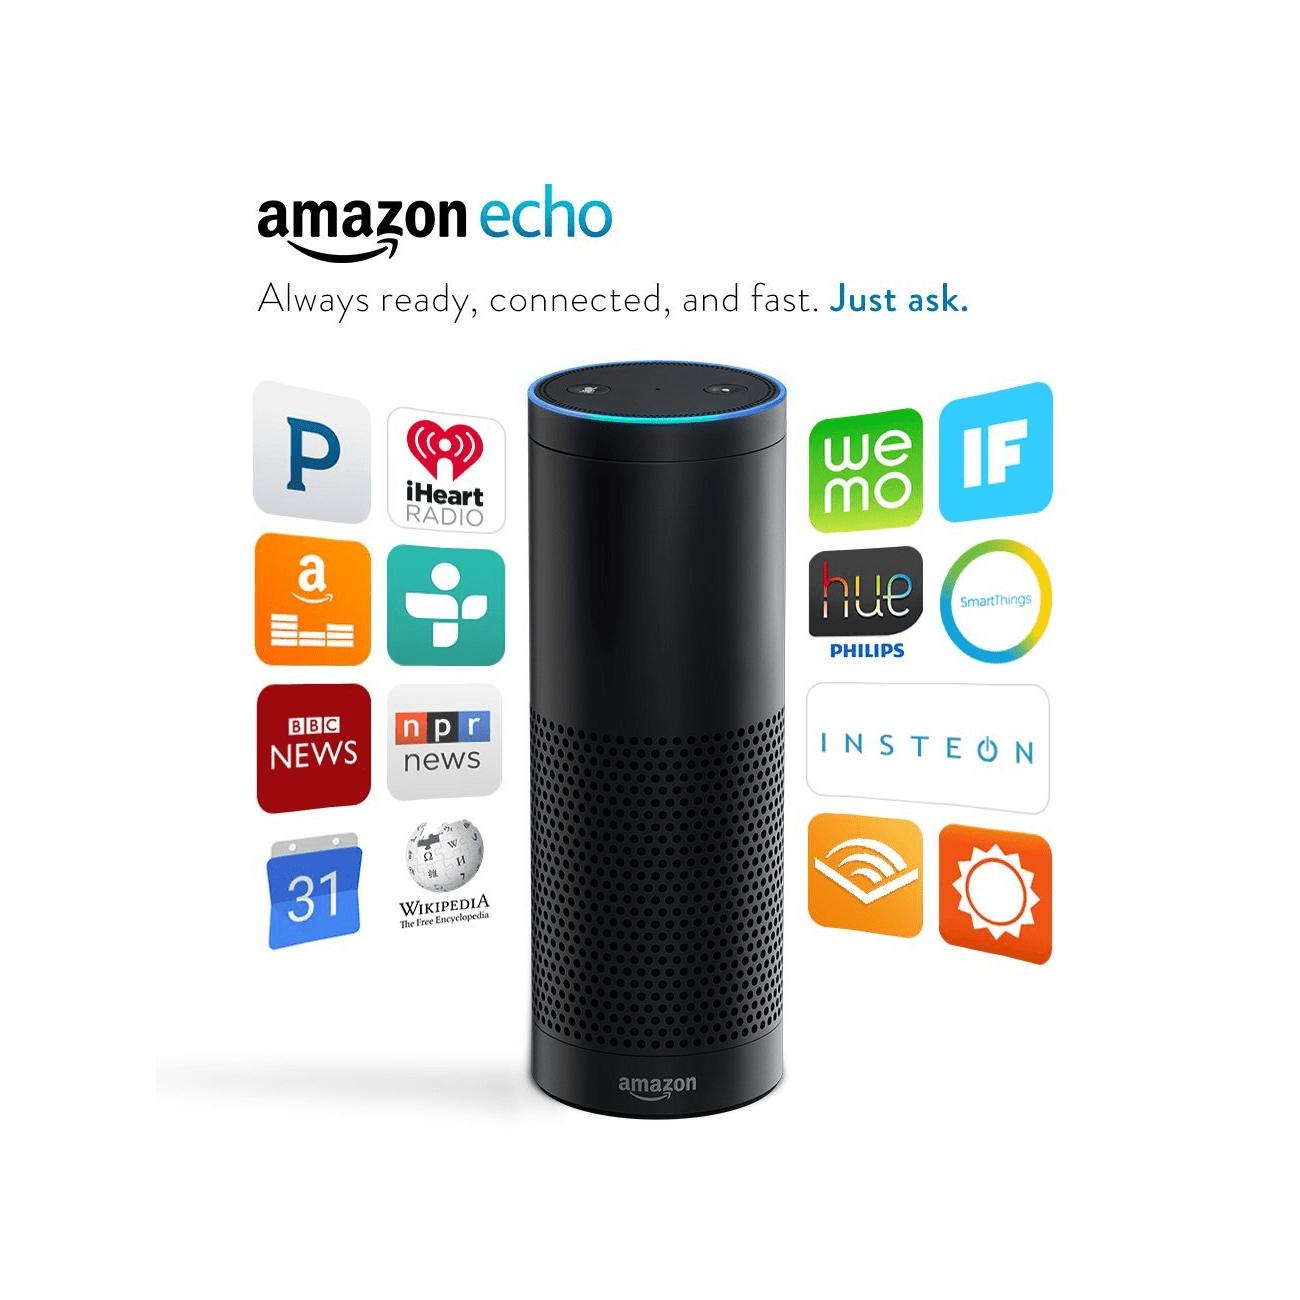 Amazon: Internet Of Things